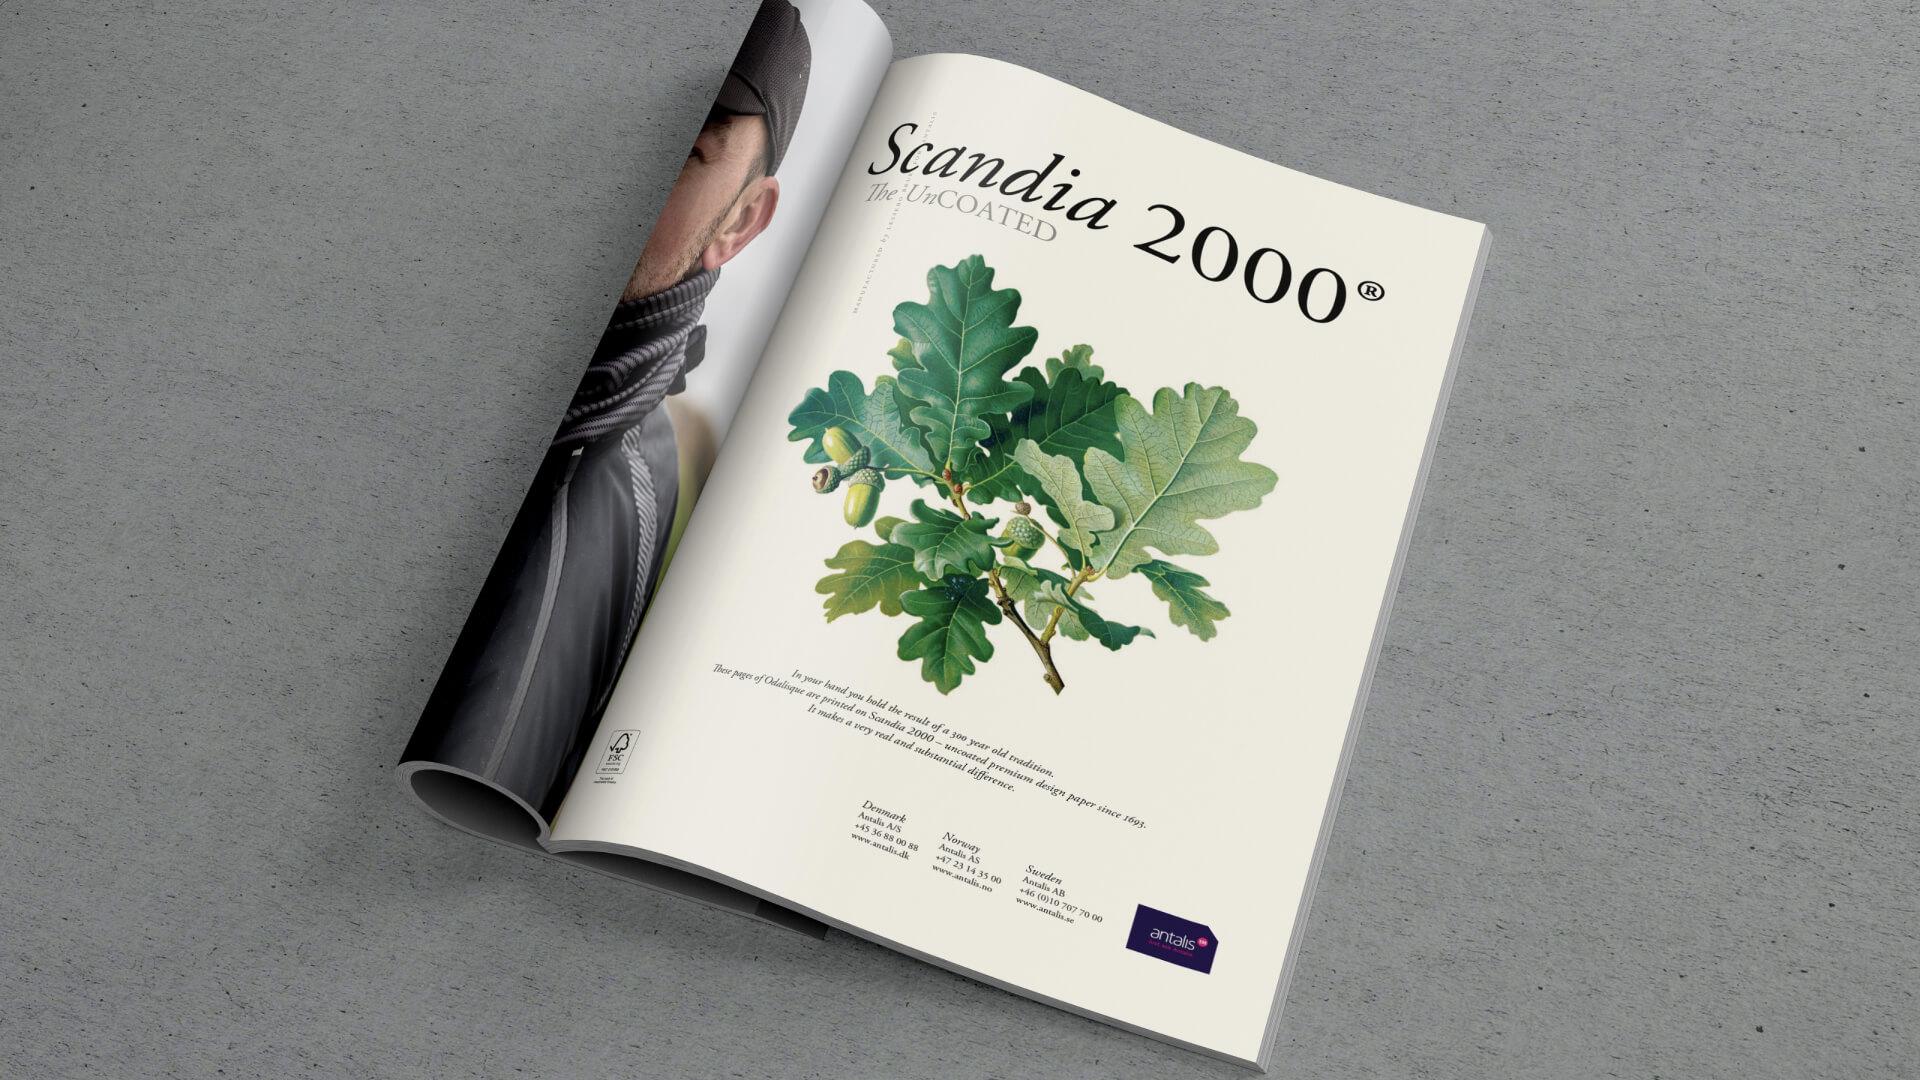 Scandia 2000 - Annons